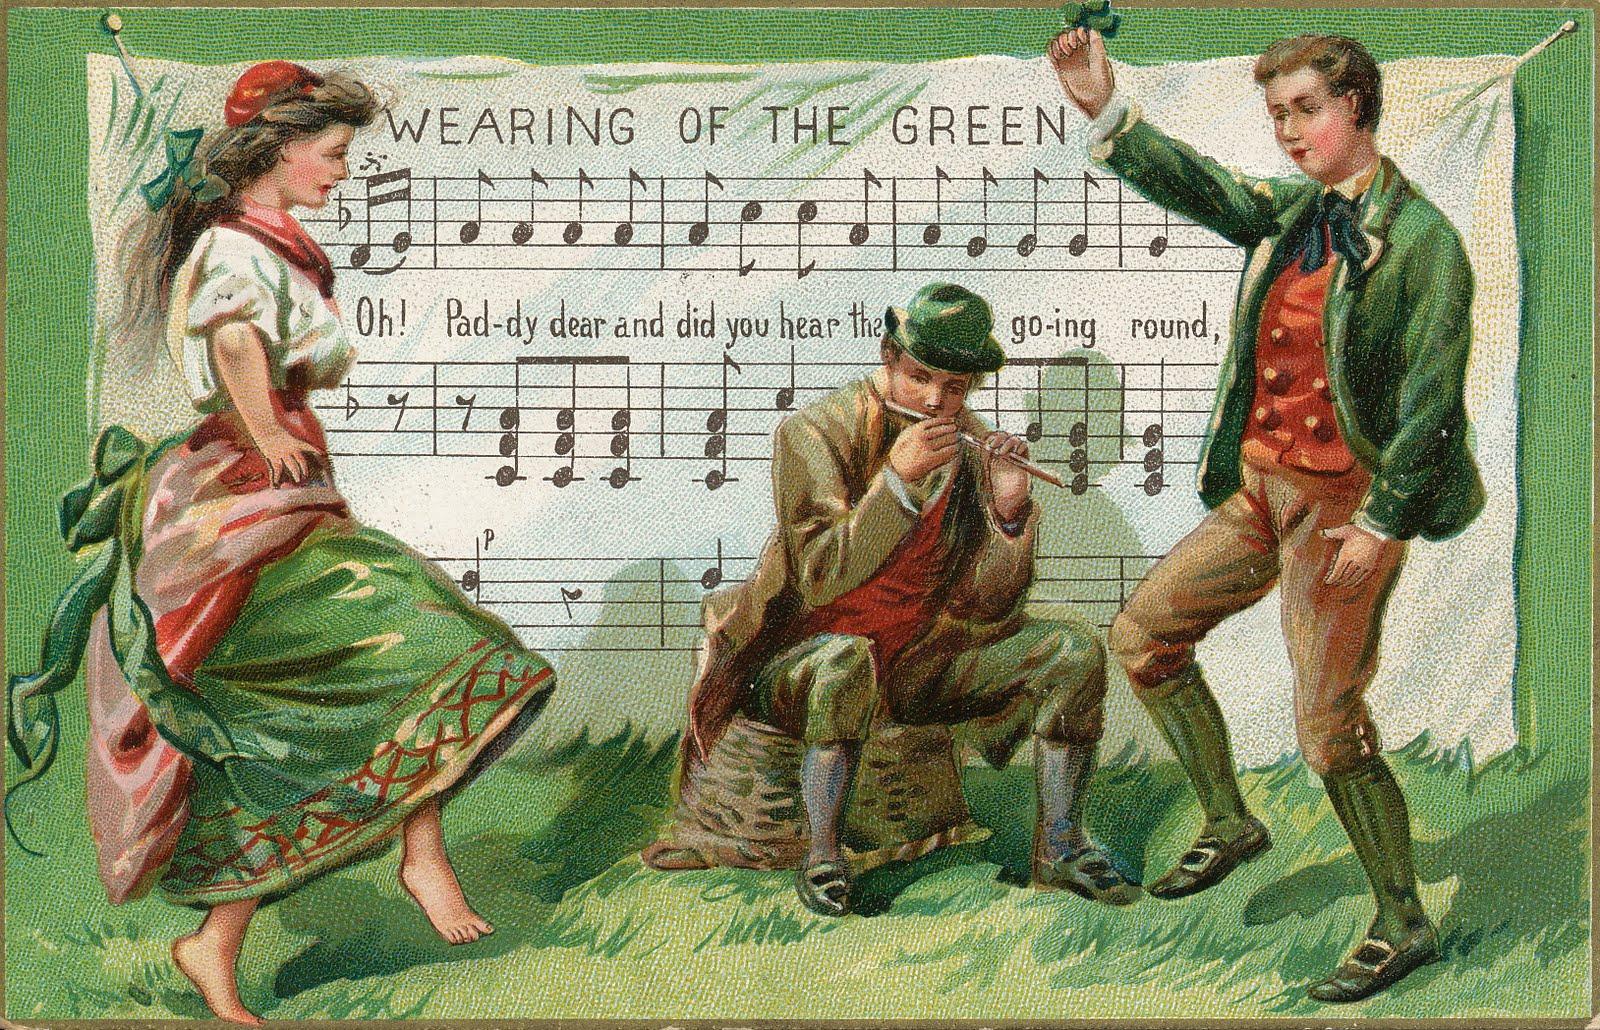 St Patricks Day Leprechaun And Dancing Couple Wallpaper